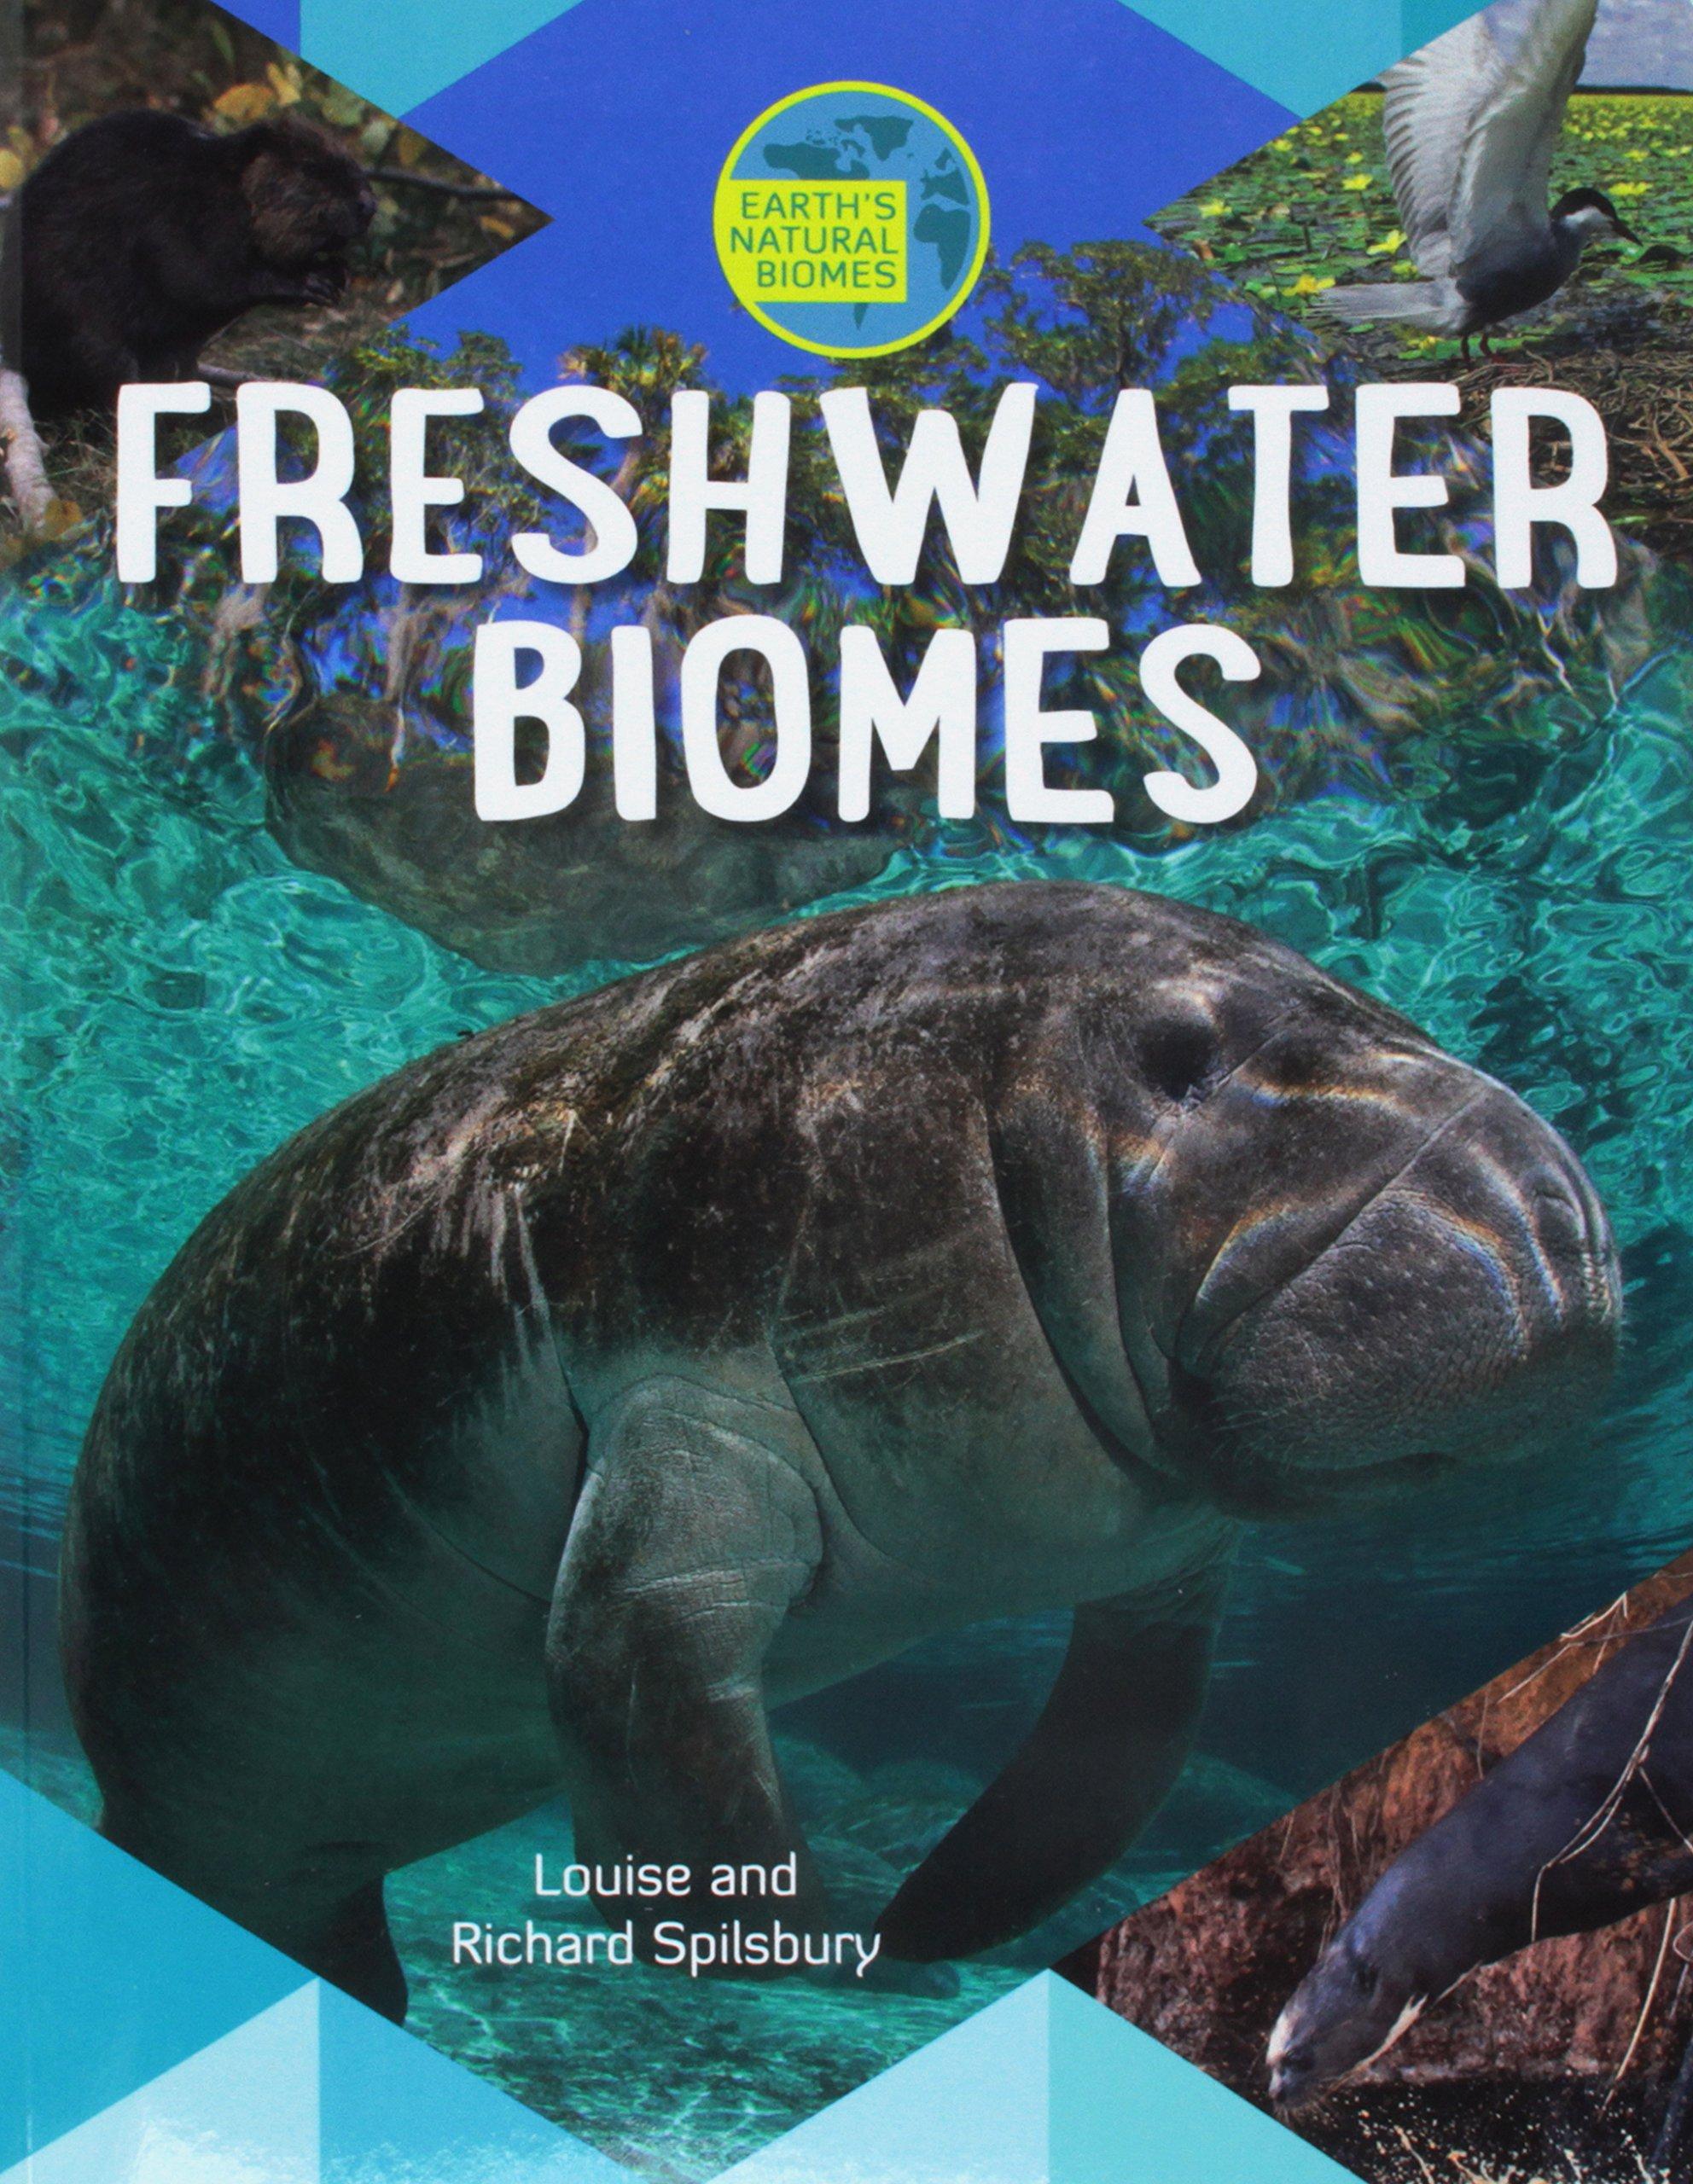 Download Freshwater Biomes (Earth's Natural Biomes) ebook